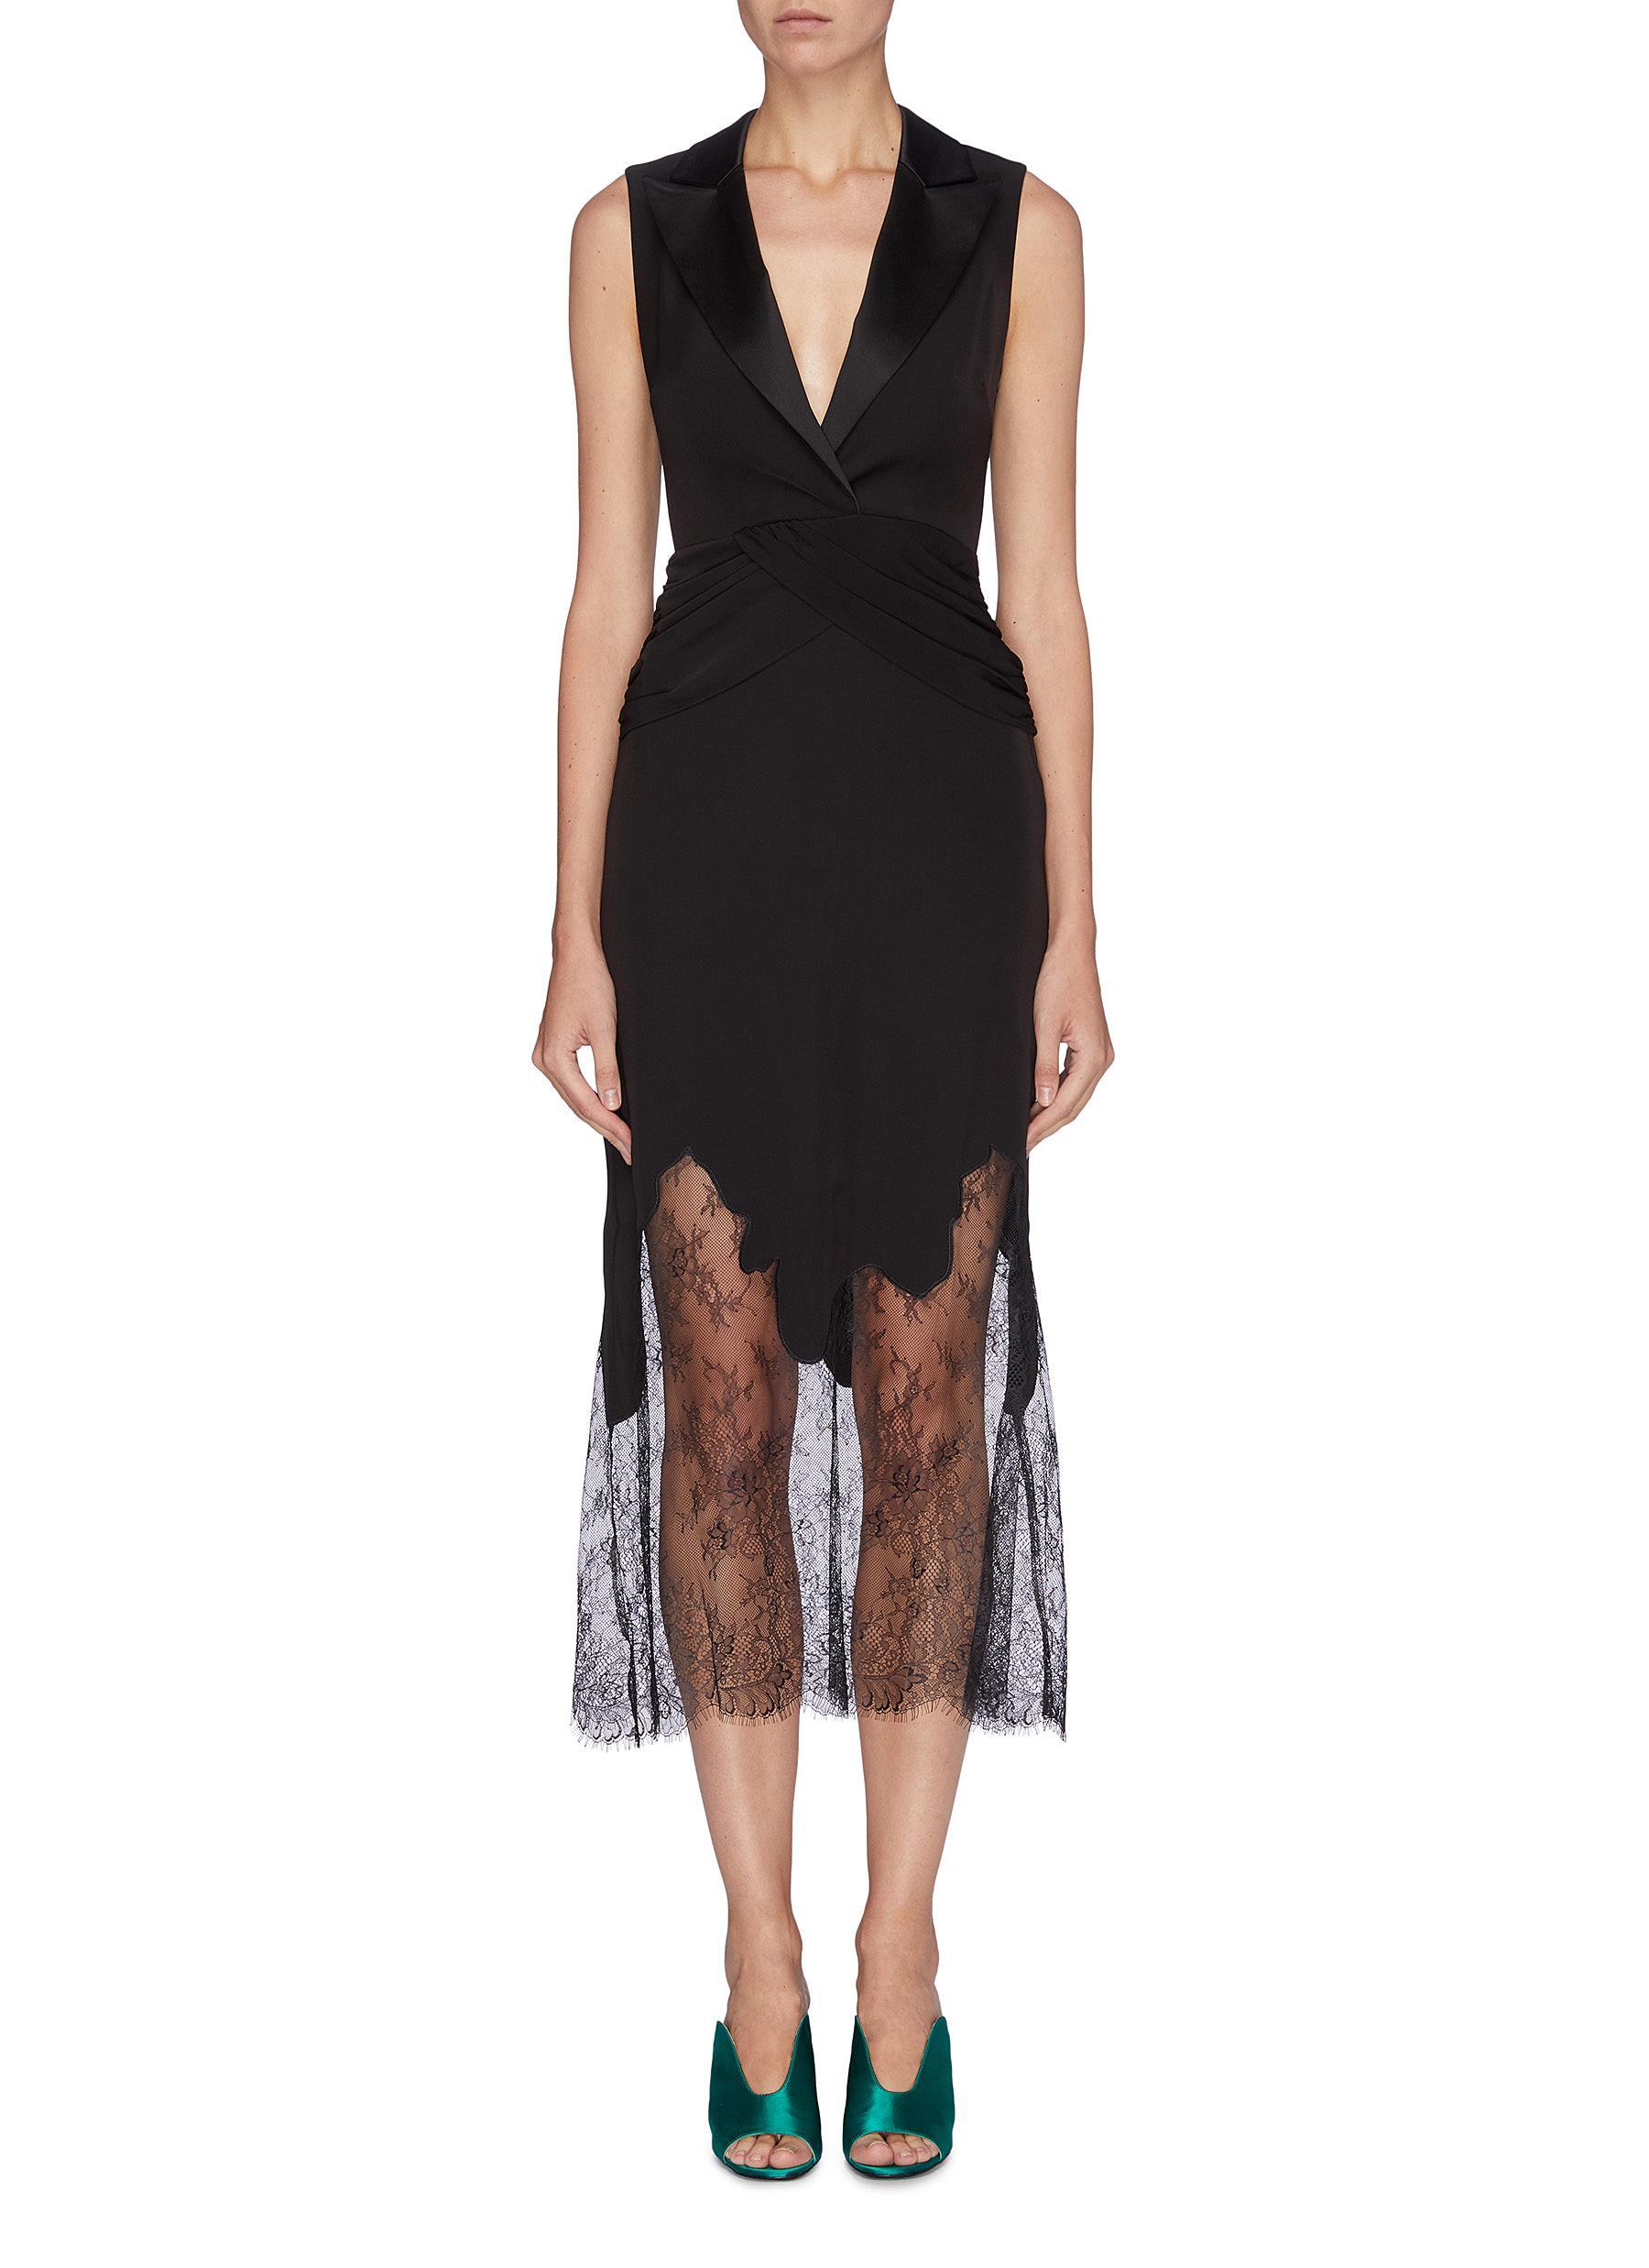 Crossover waist lace hem sleeveless dress by Self-Portrait